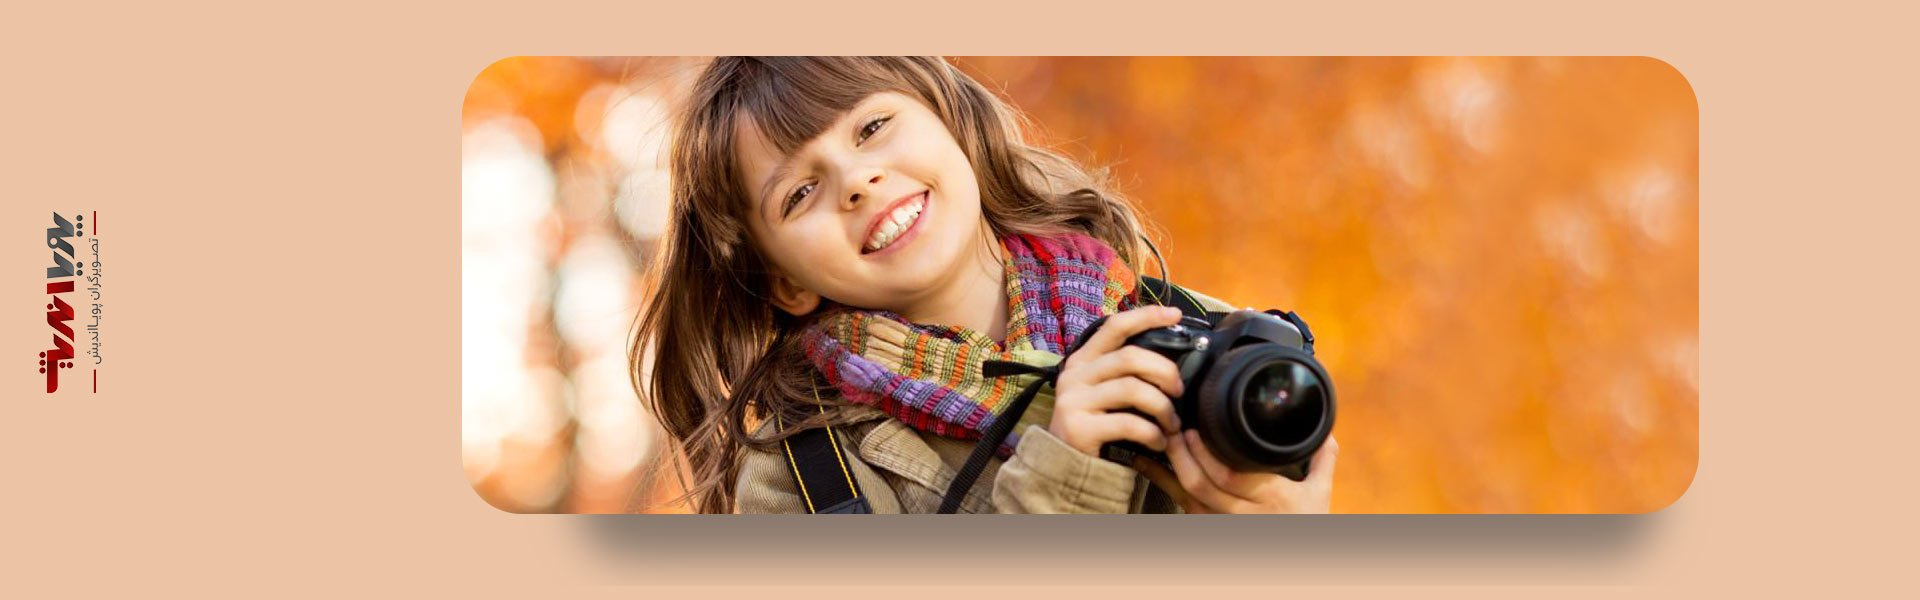 girl photographer 3 - چرا کودکان ما باید عکاسی بیاموزند ؟